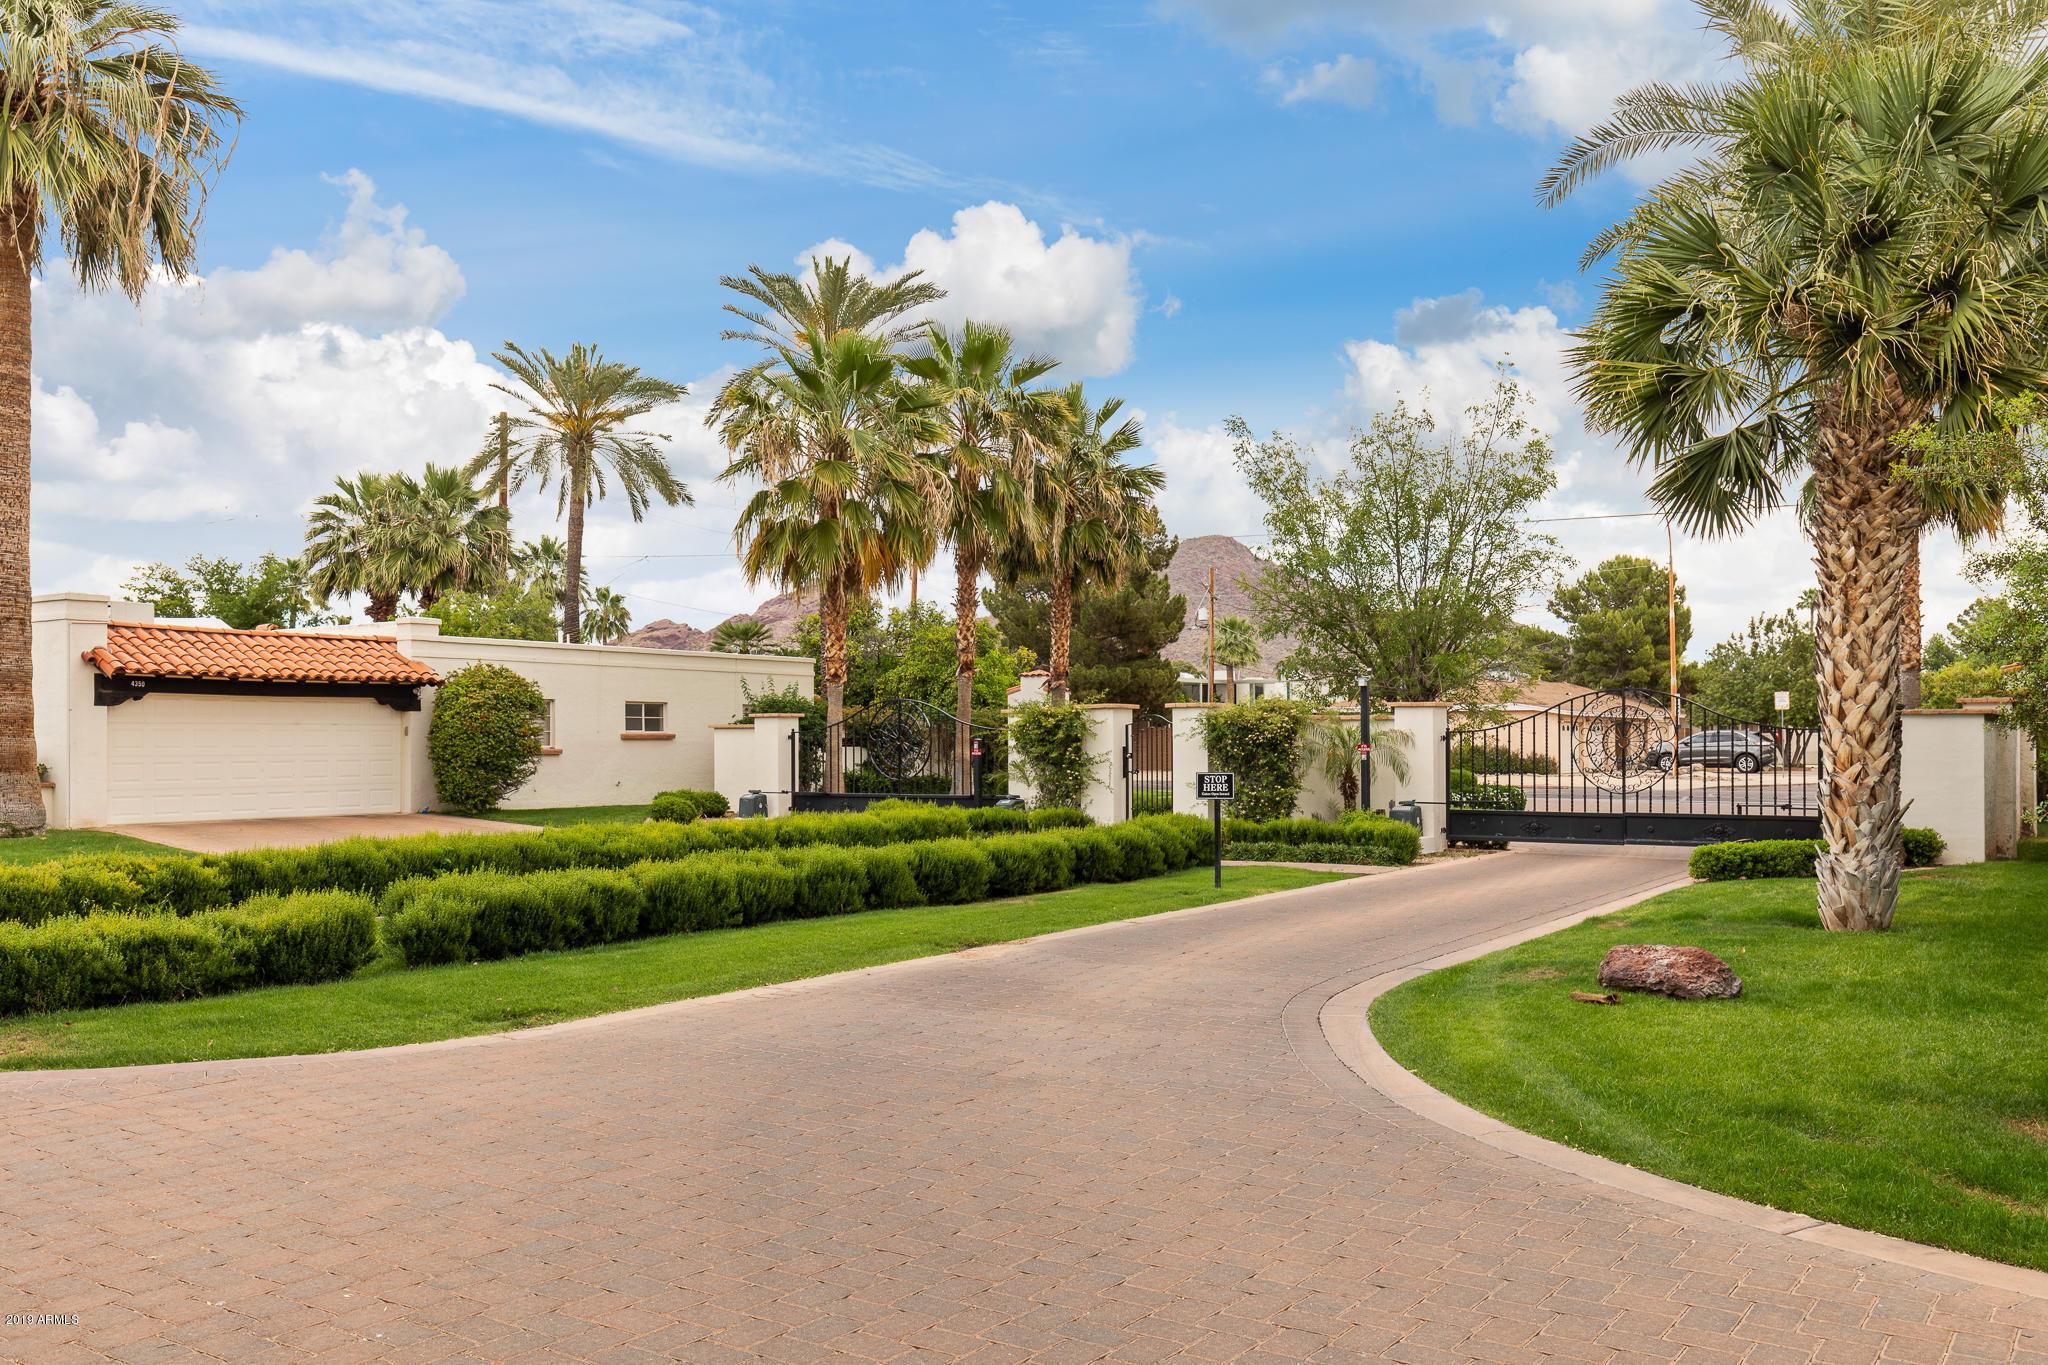 4352 N 40TH Phoenix, AZ 85018 Photo #3